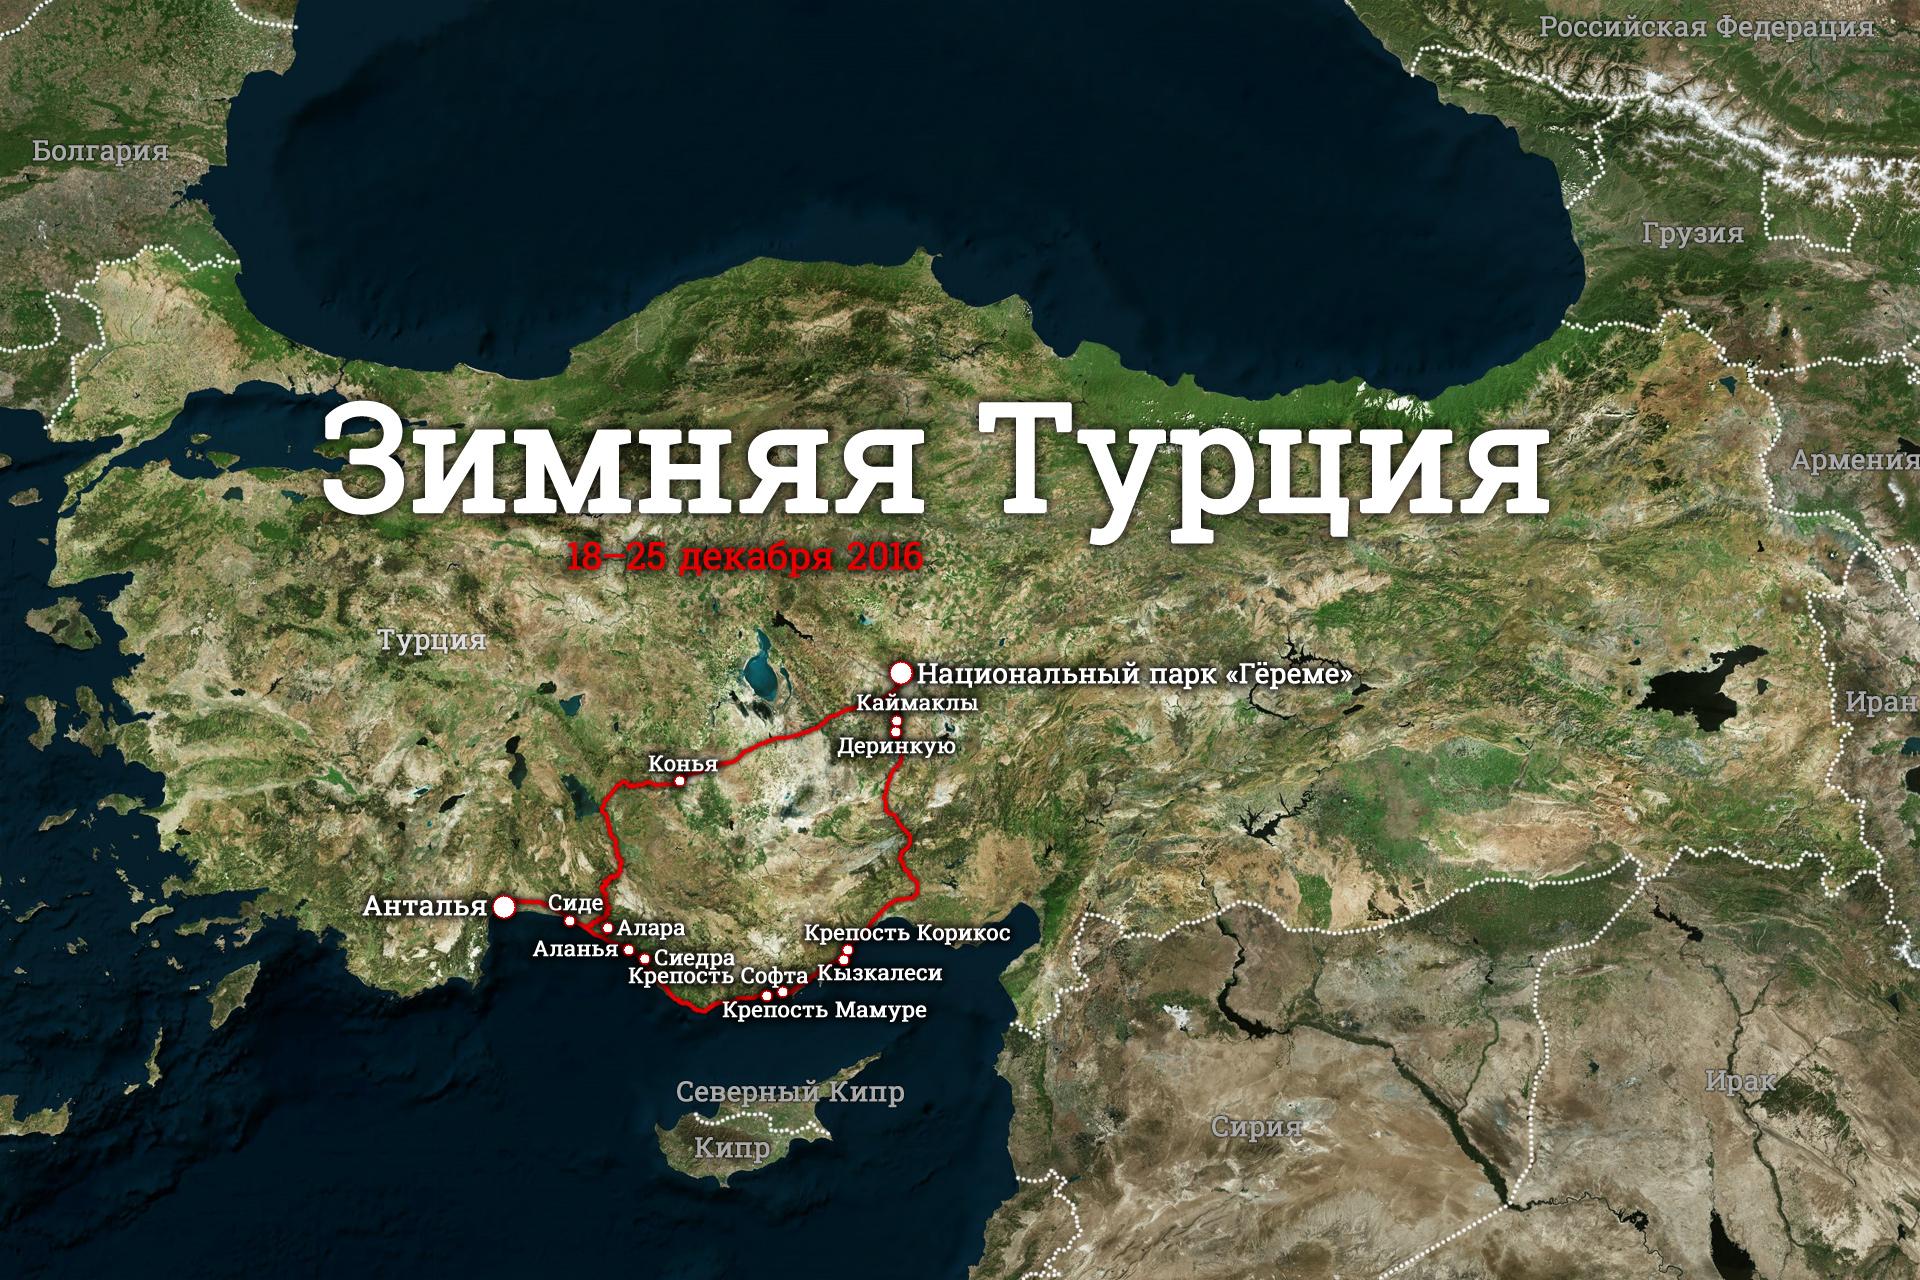 Маршрут путешествия «Зимняя Турция»